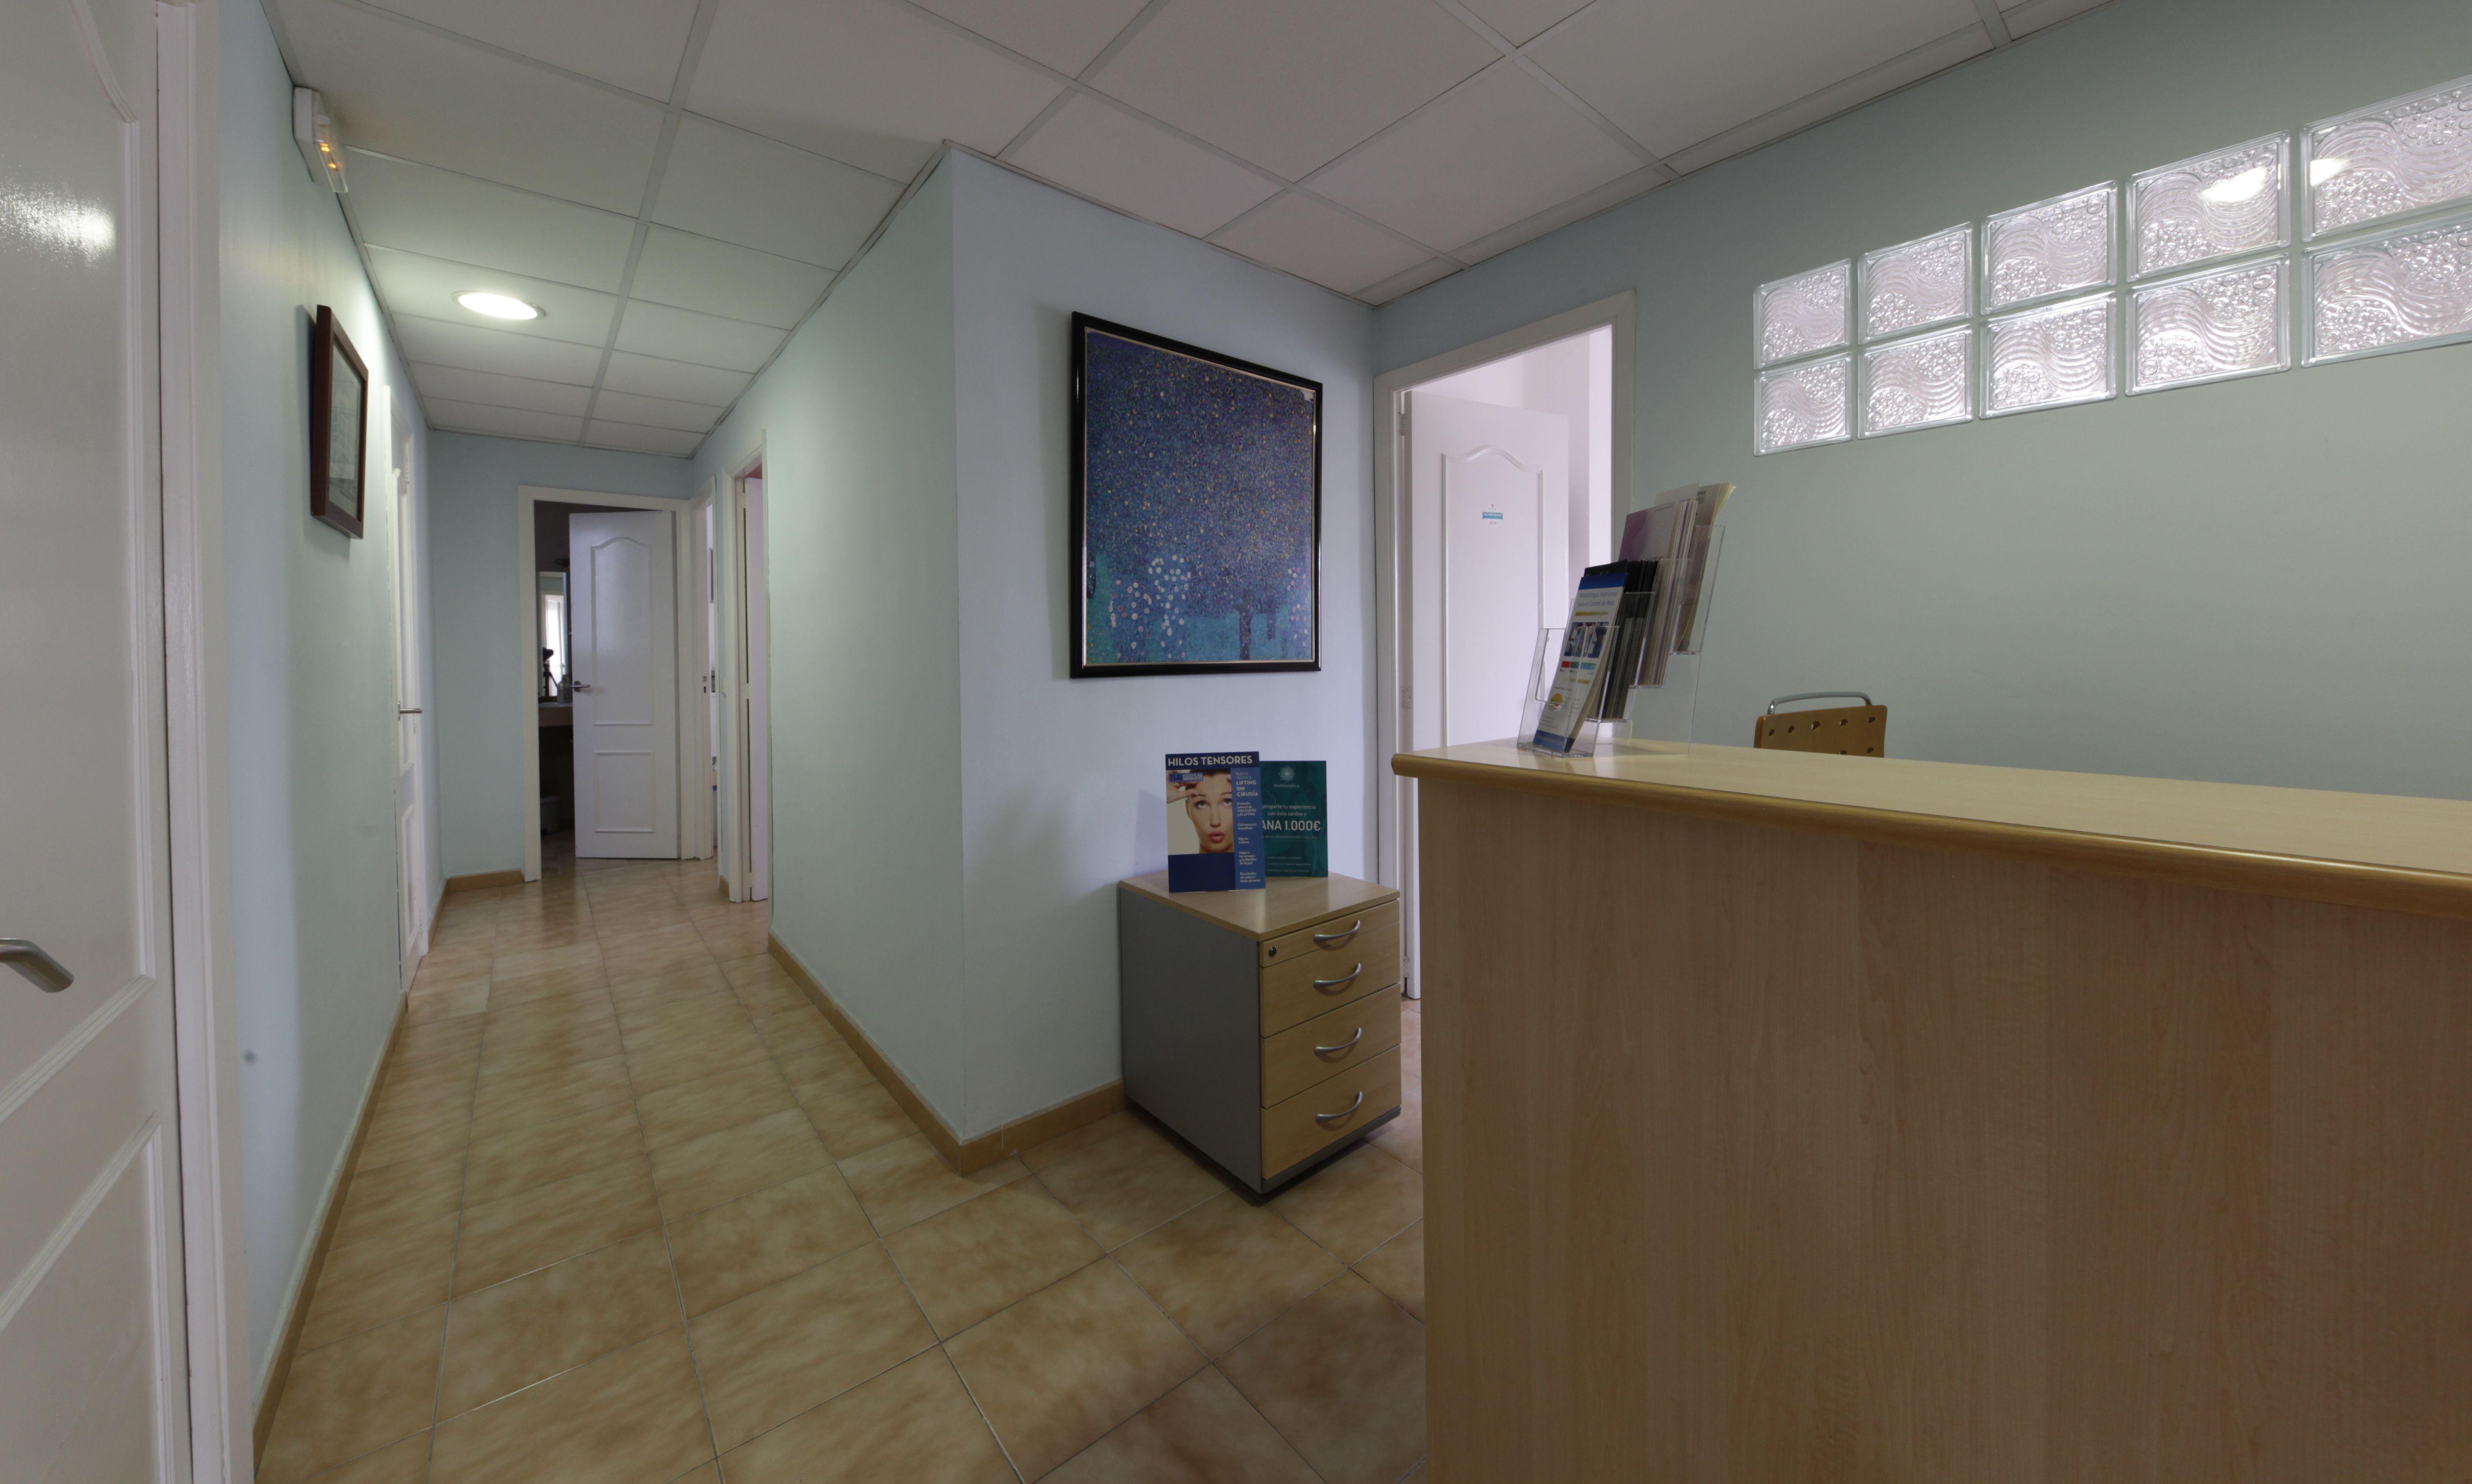 Instalaciones de la consulta de la Dra. Arrom en Palma de Mallorca